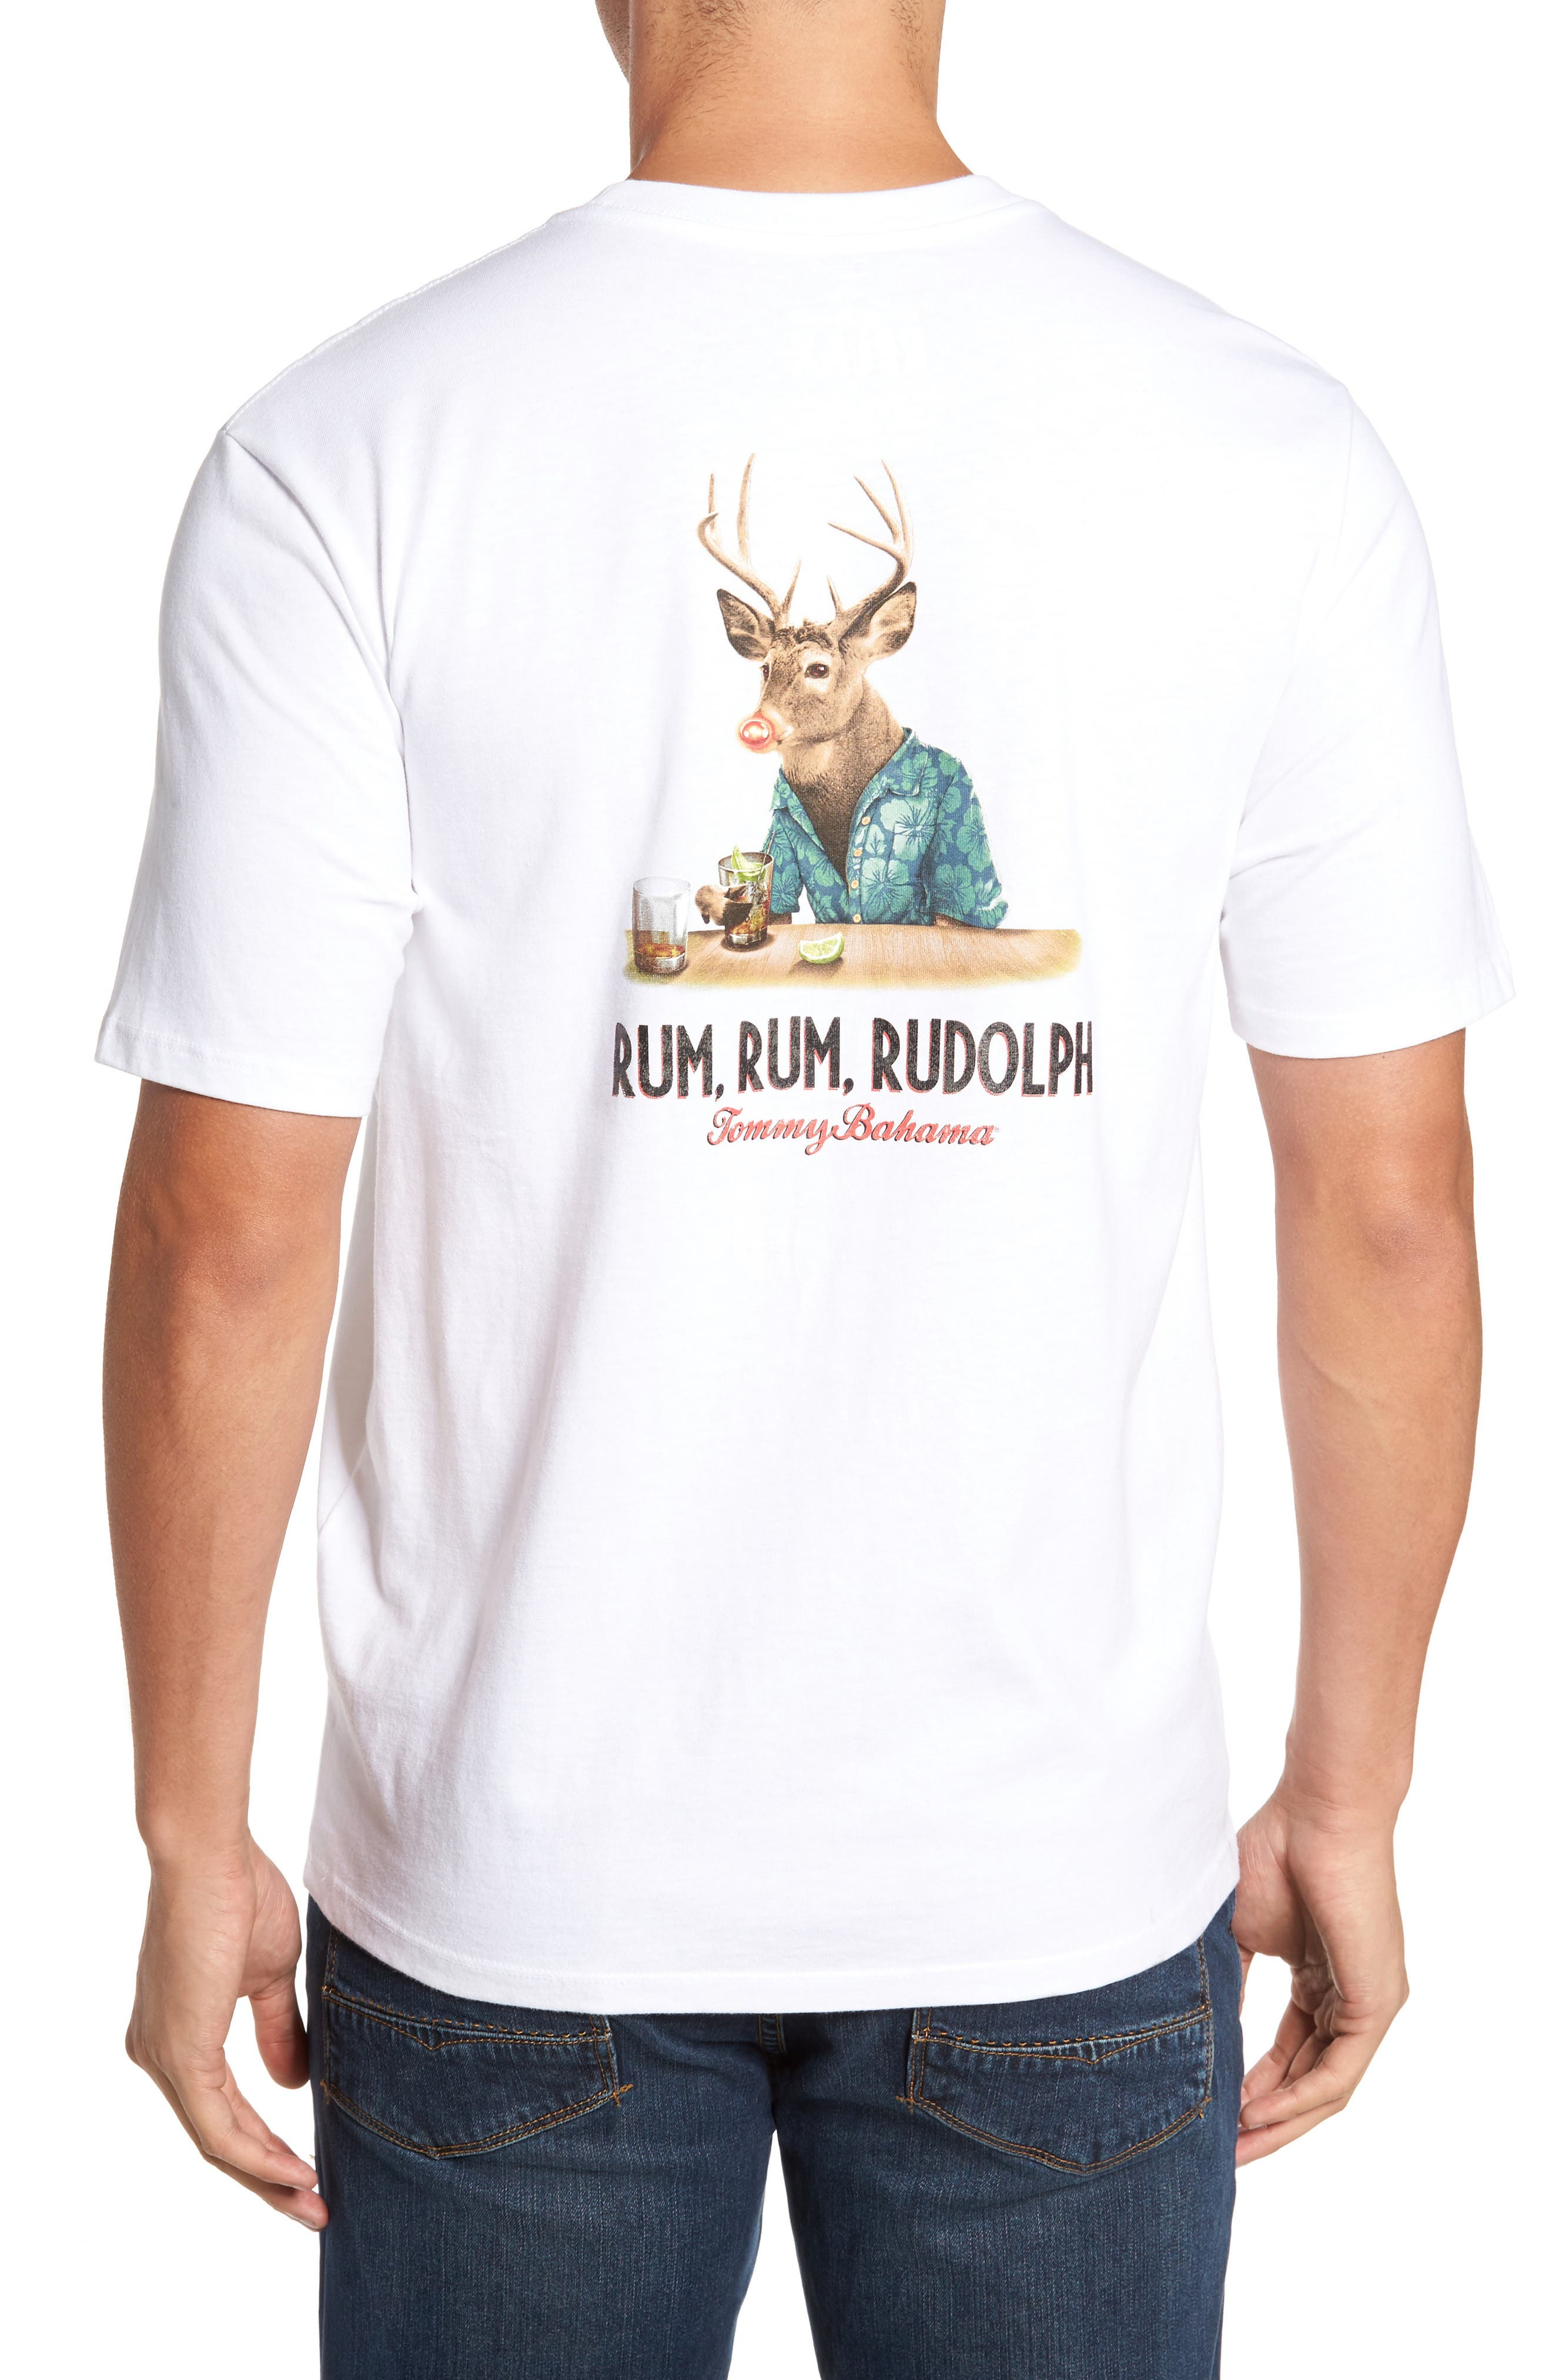 Tommy Bahama Rum Rum Rudolph T-Shirt